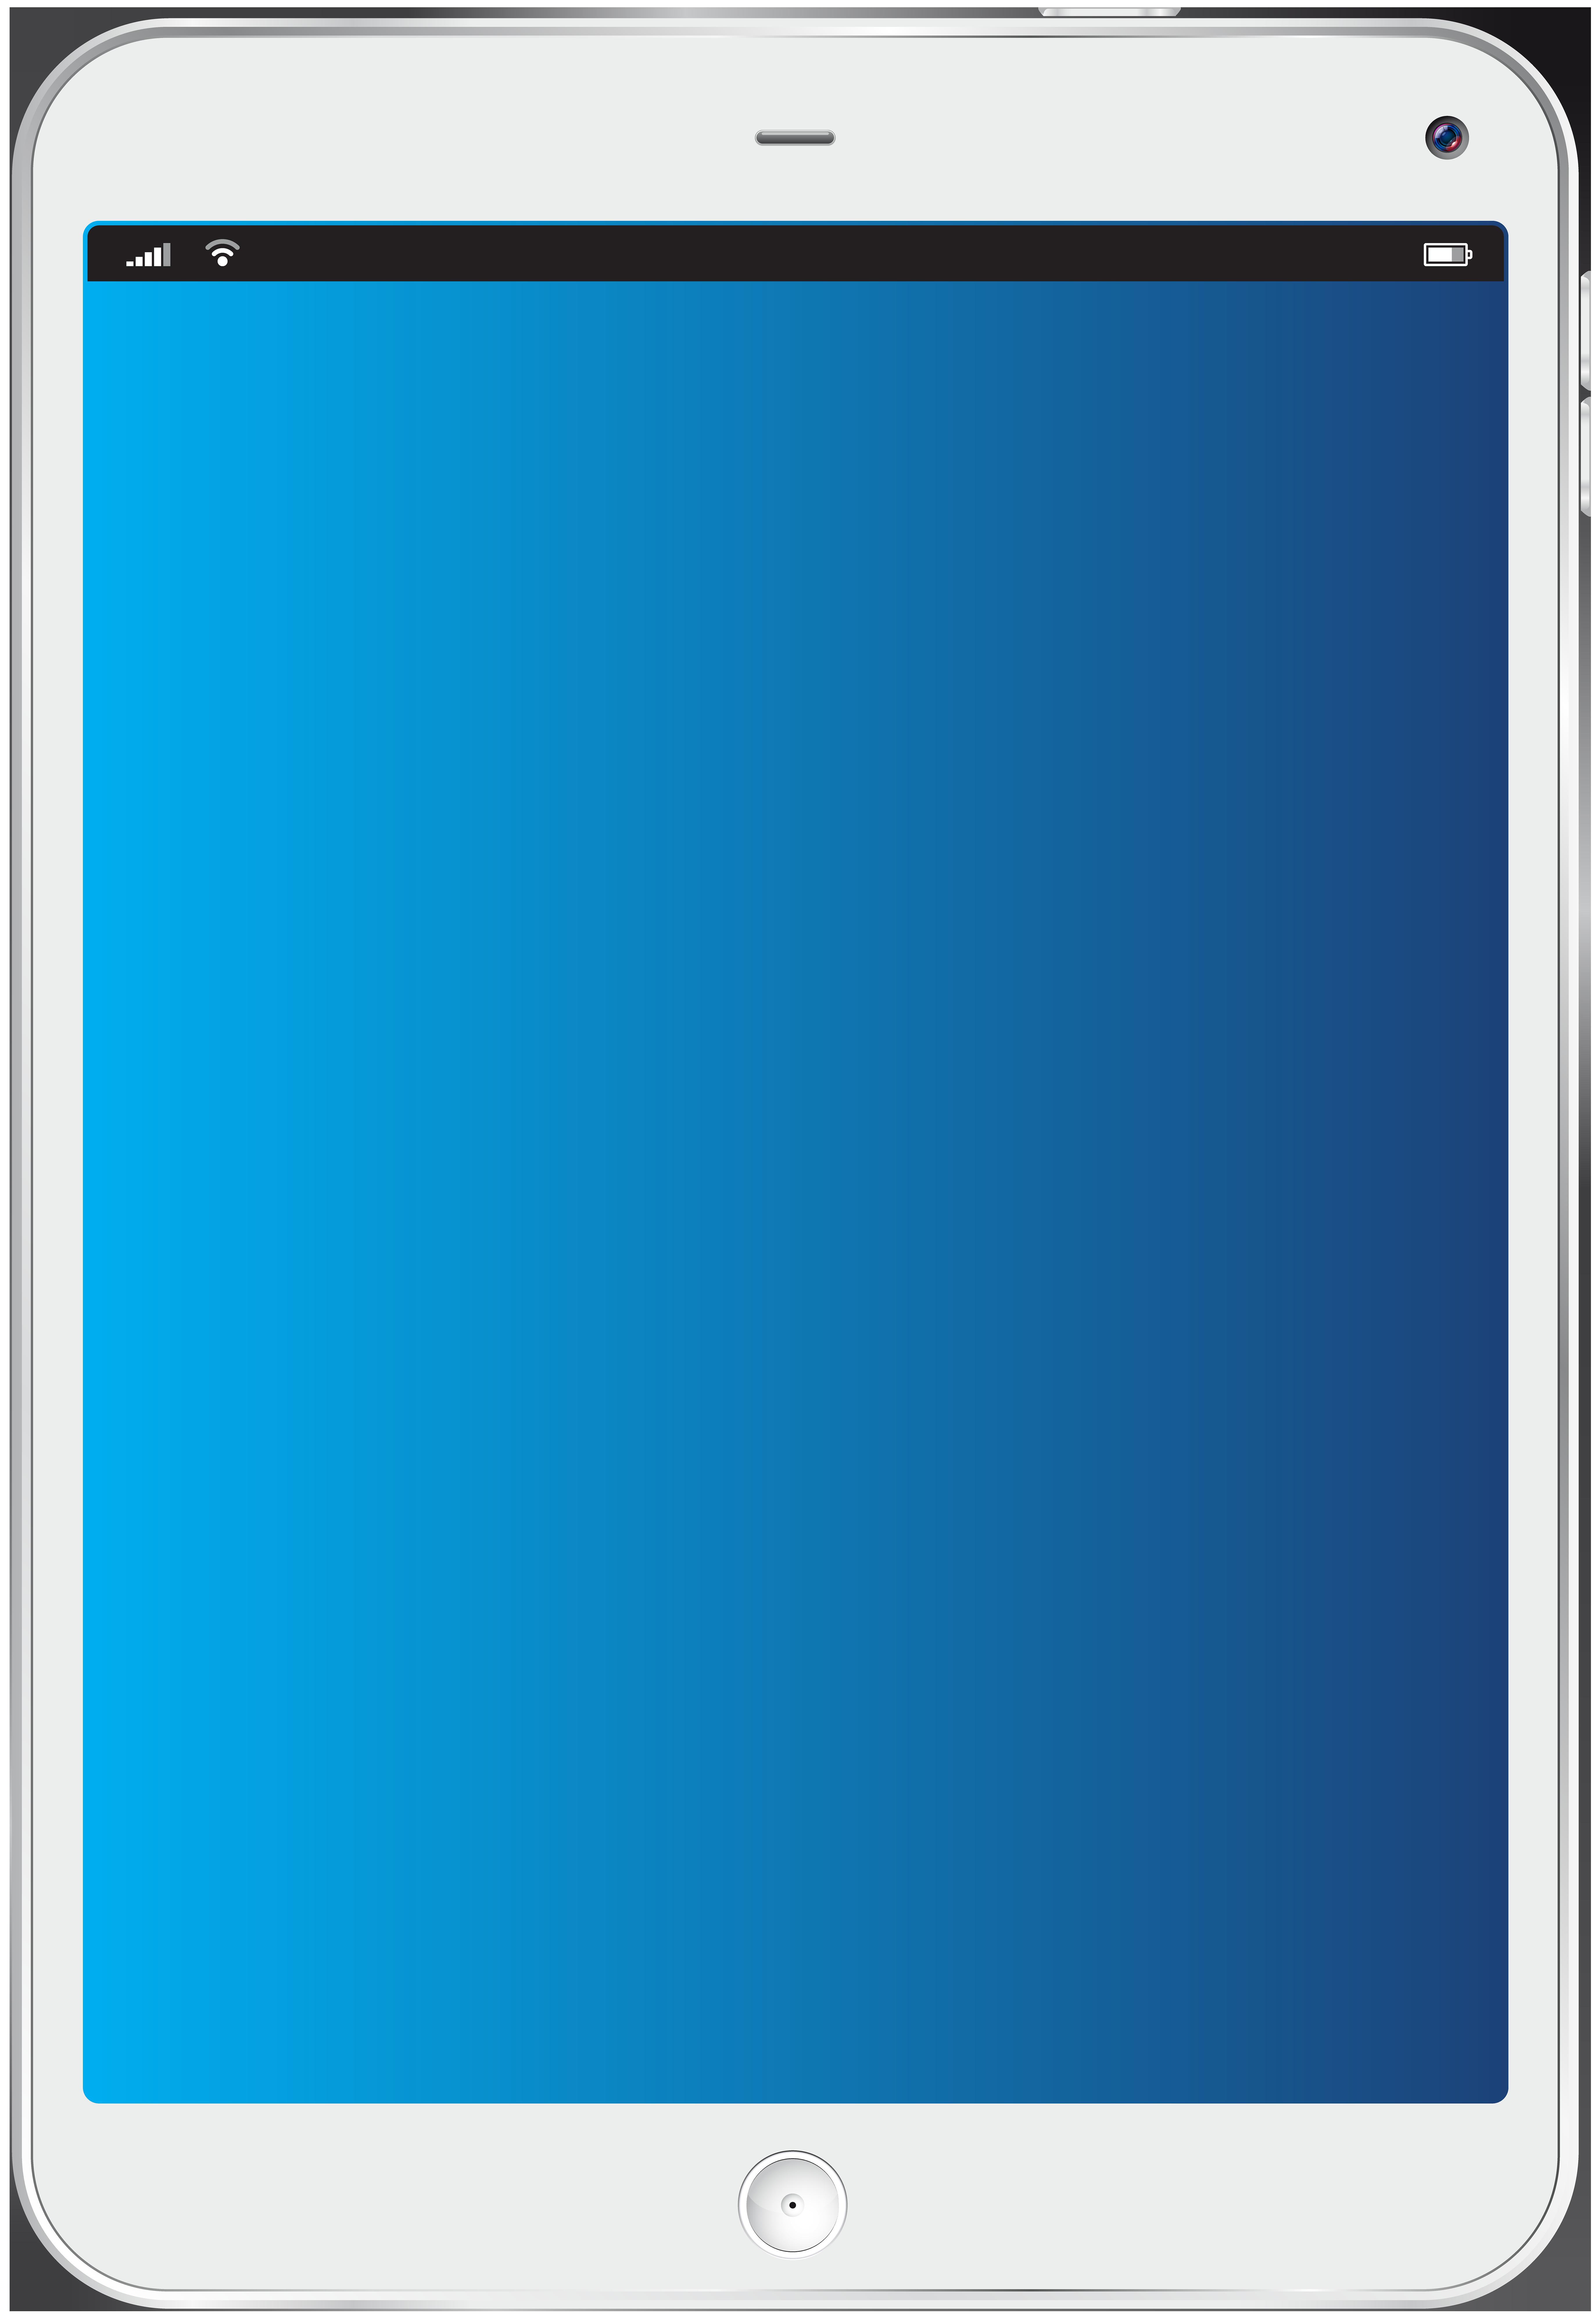 White Tablet Transparent PNG Clip Art Image.